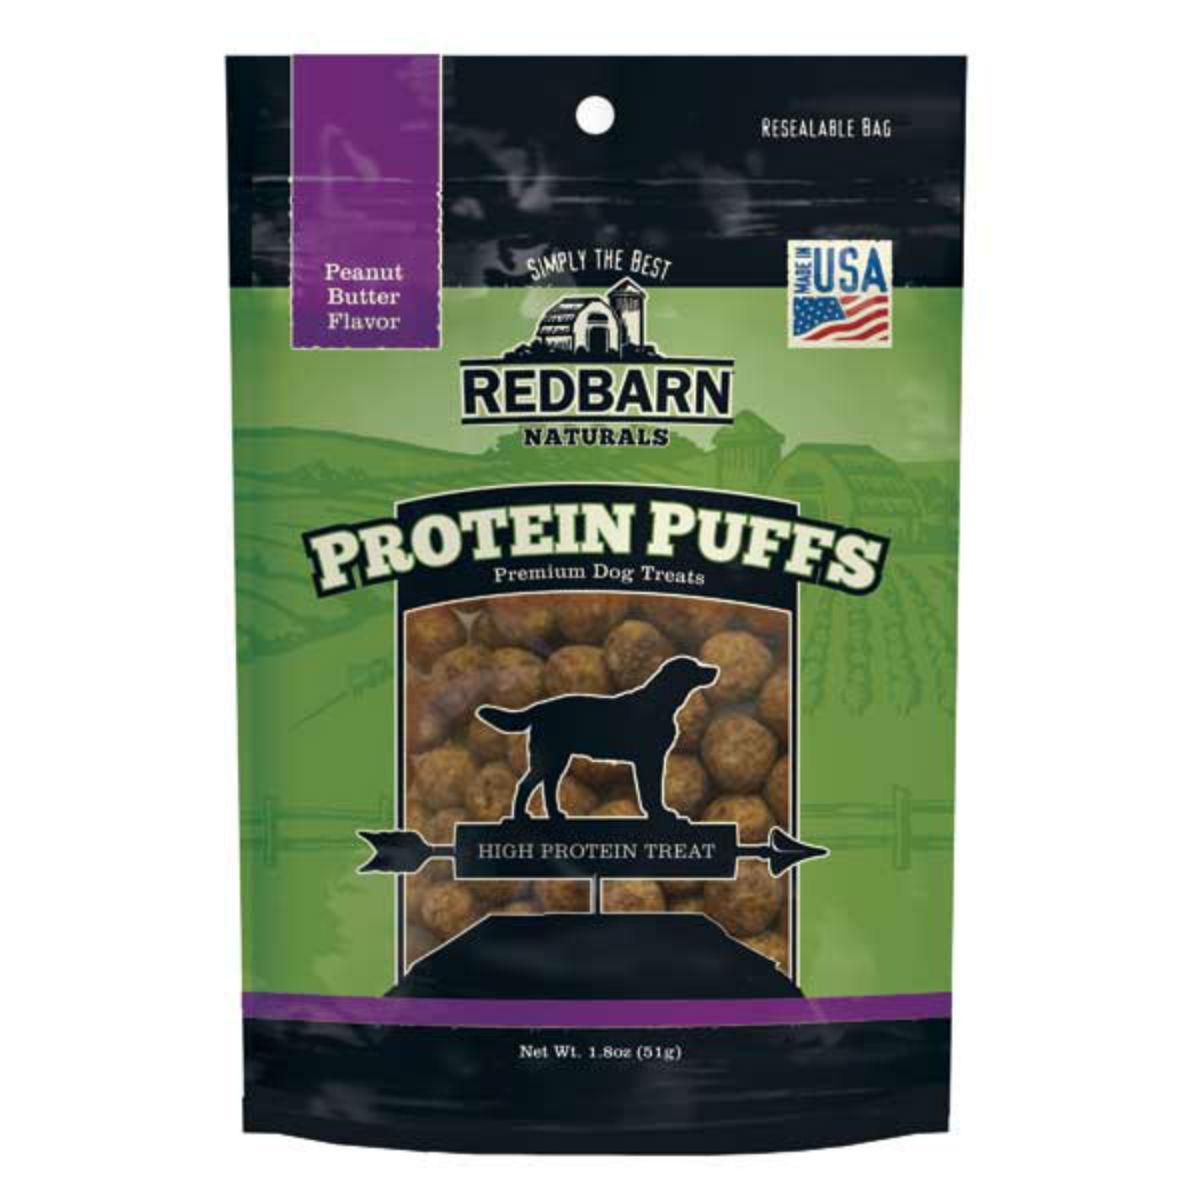 Redbarn Protein Puffs Dog Treat - Peanut Butter